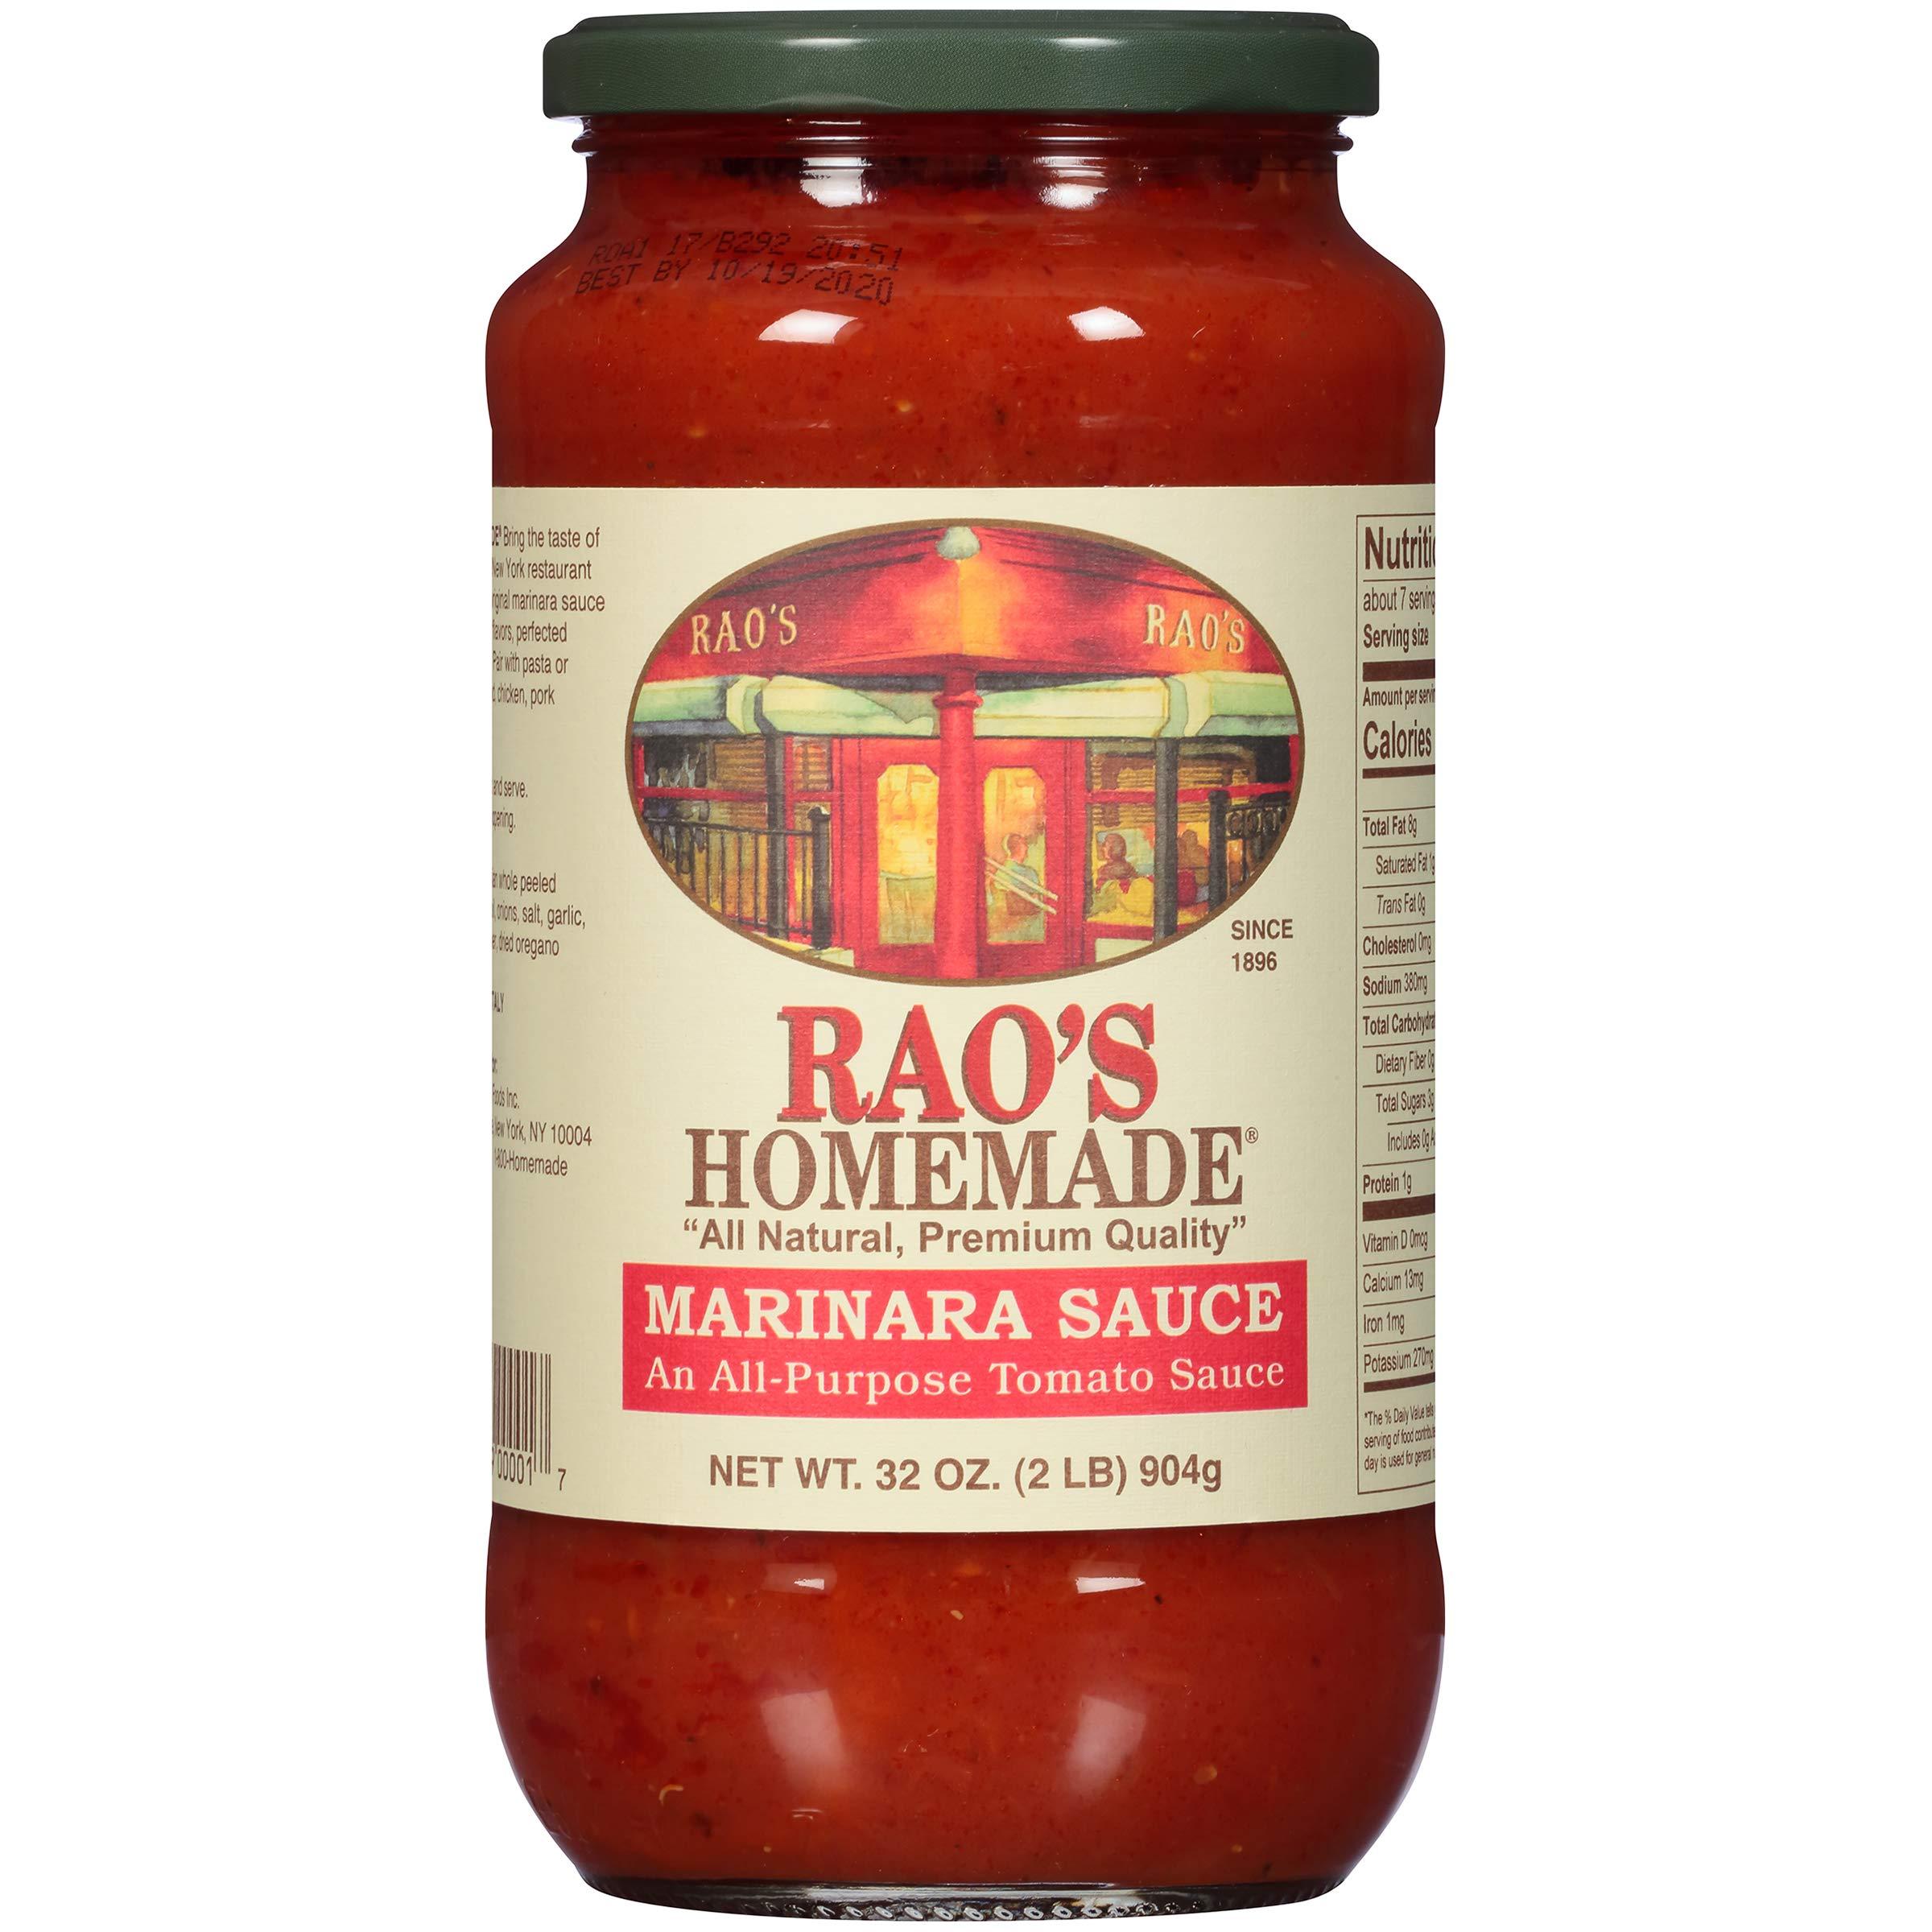 Rao's Homemade Marinara Sauce, 32 Oz Jar, Classic Italian Tomato Sauce, Great on Pasta, Made With Fresh Basil, Italian Tomatoes, Garlic, and Seasonings, No Sugar Added